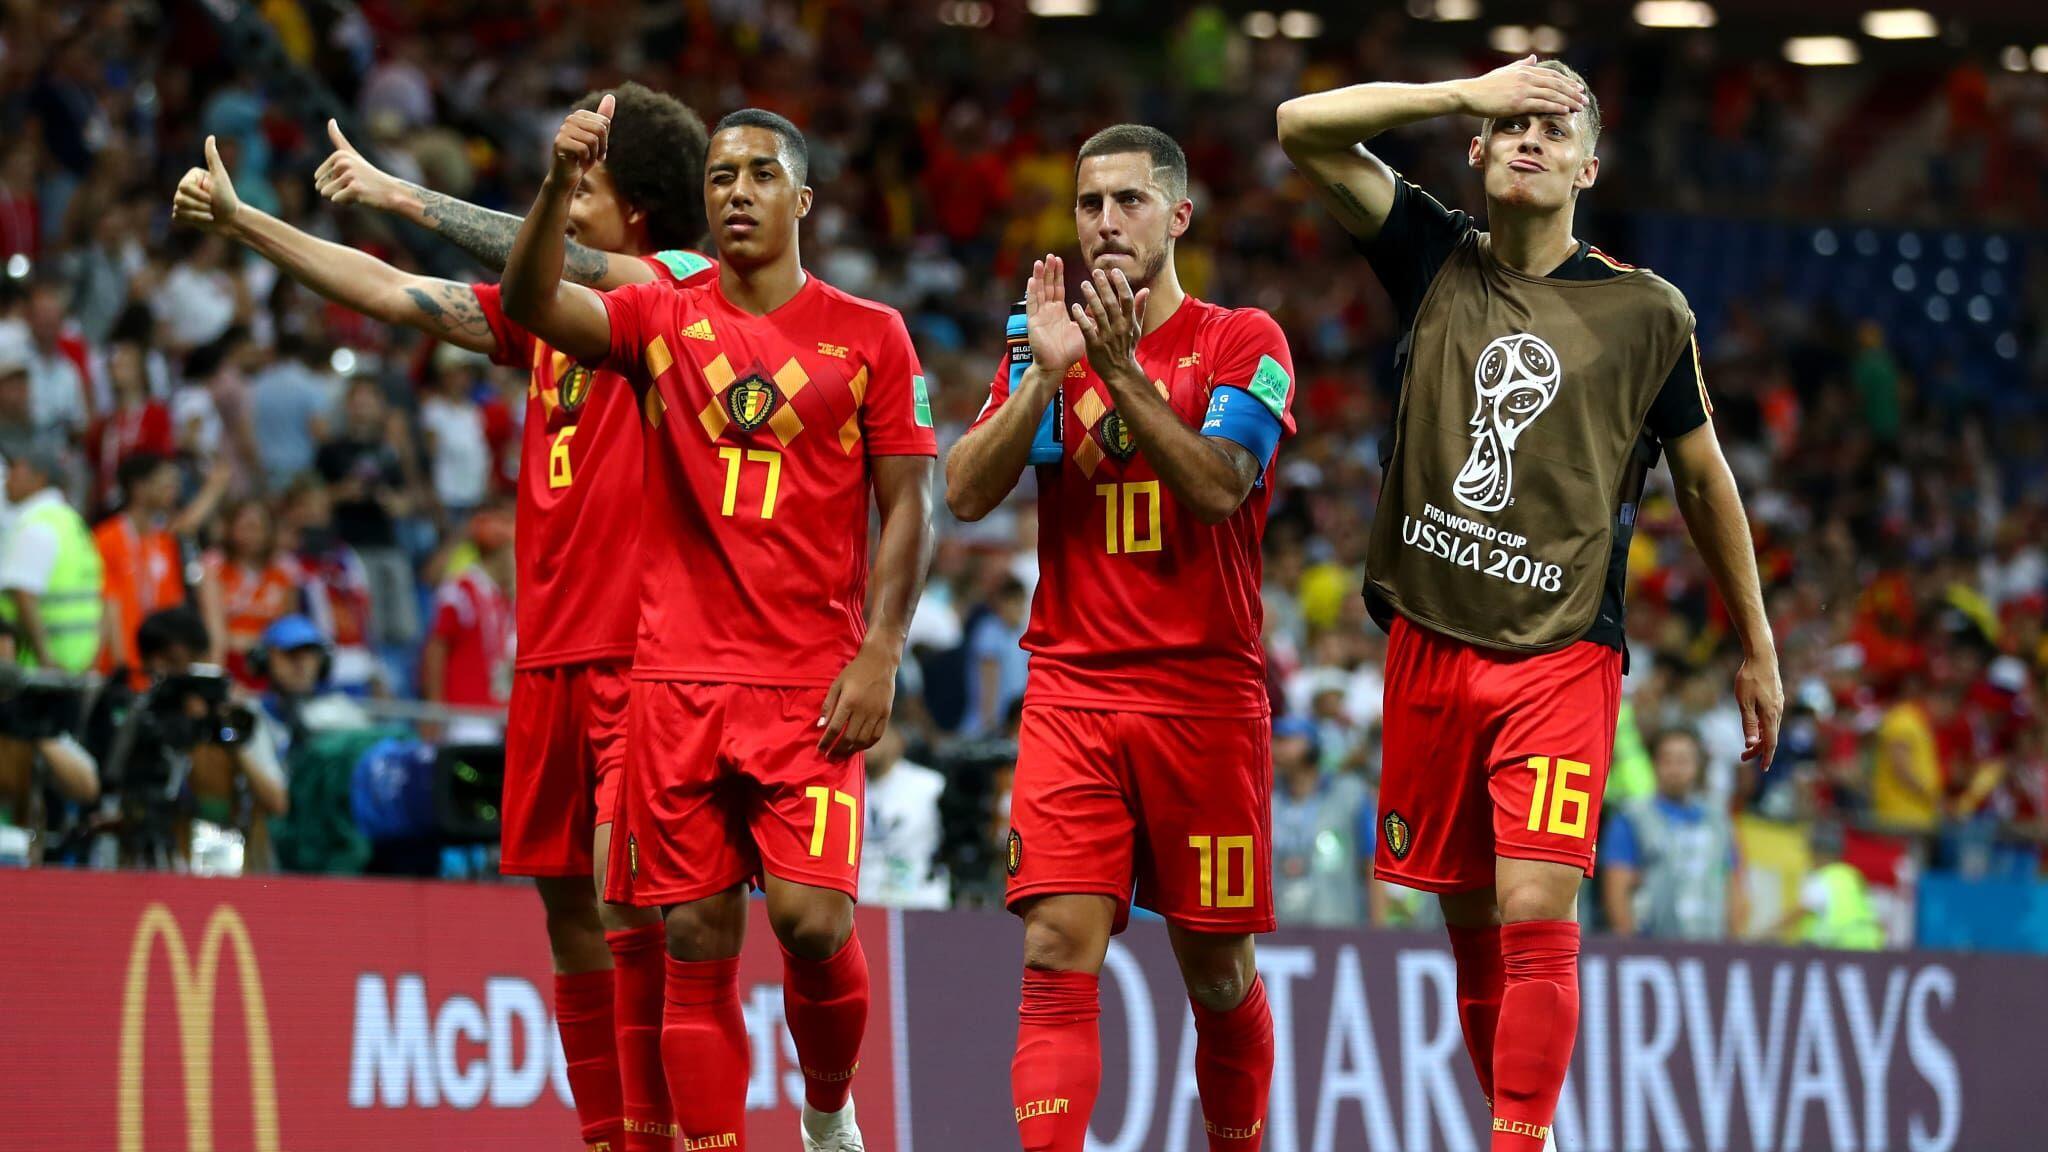 Rampungkan 16 Besar, Berikut Catatan Statistik Menarik Piala Dunia